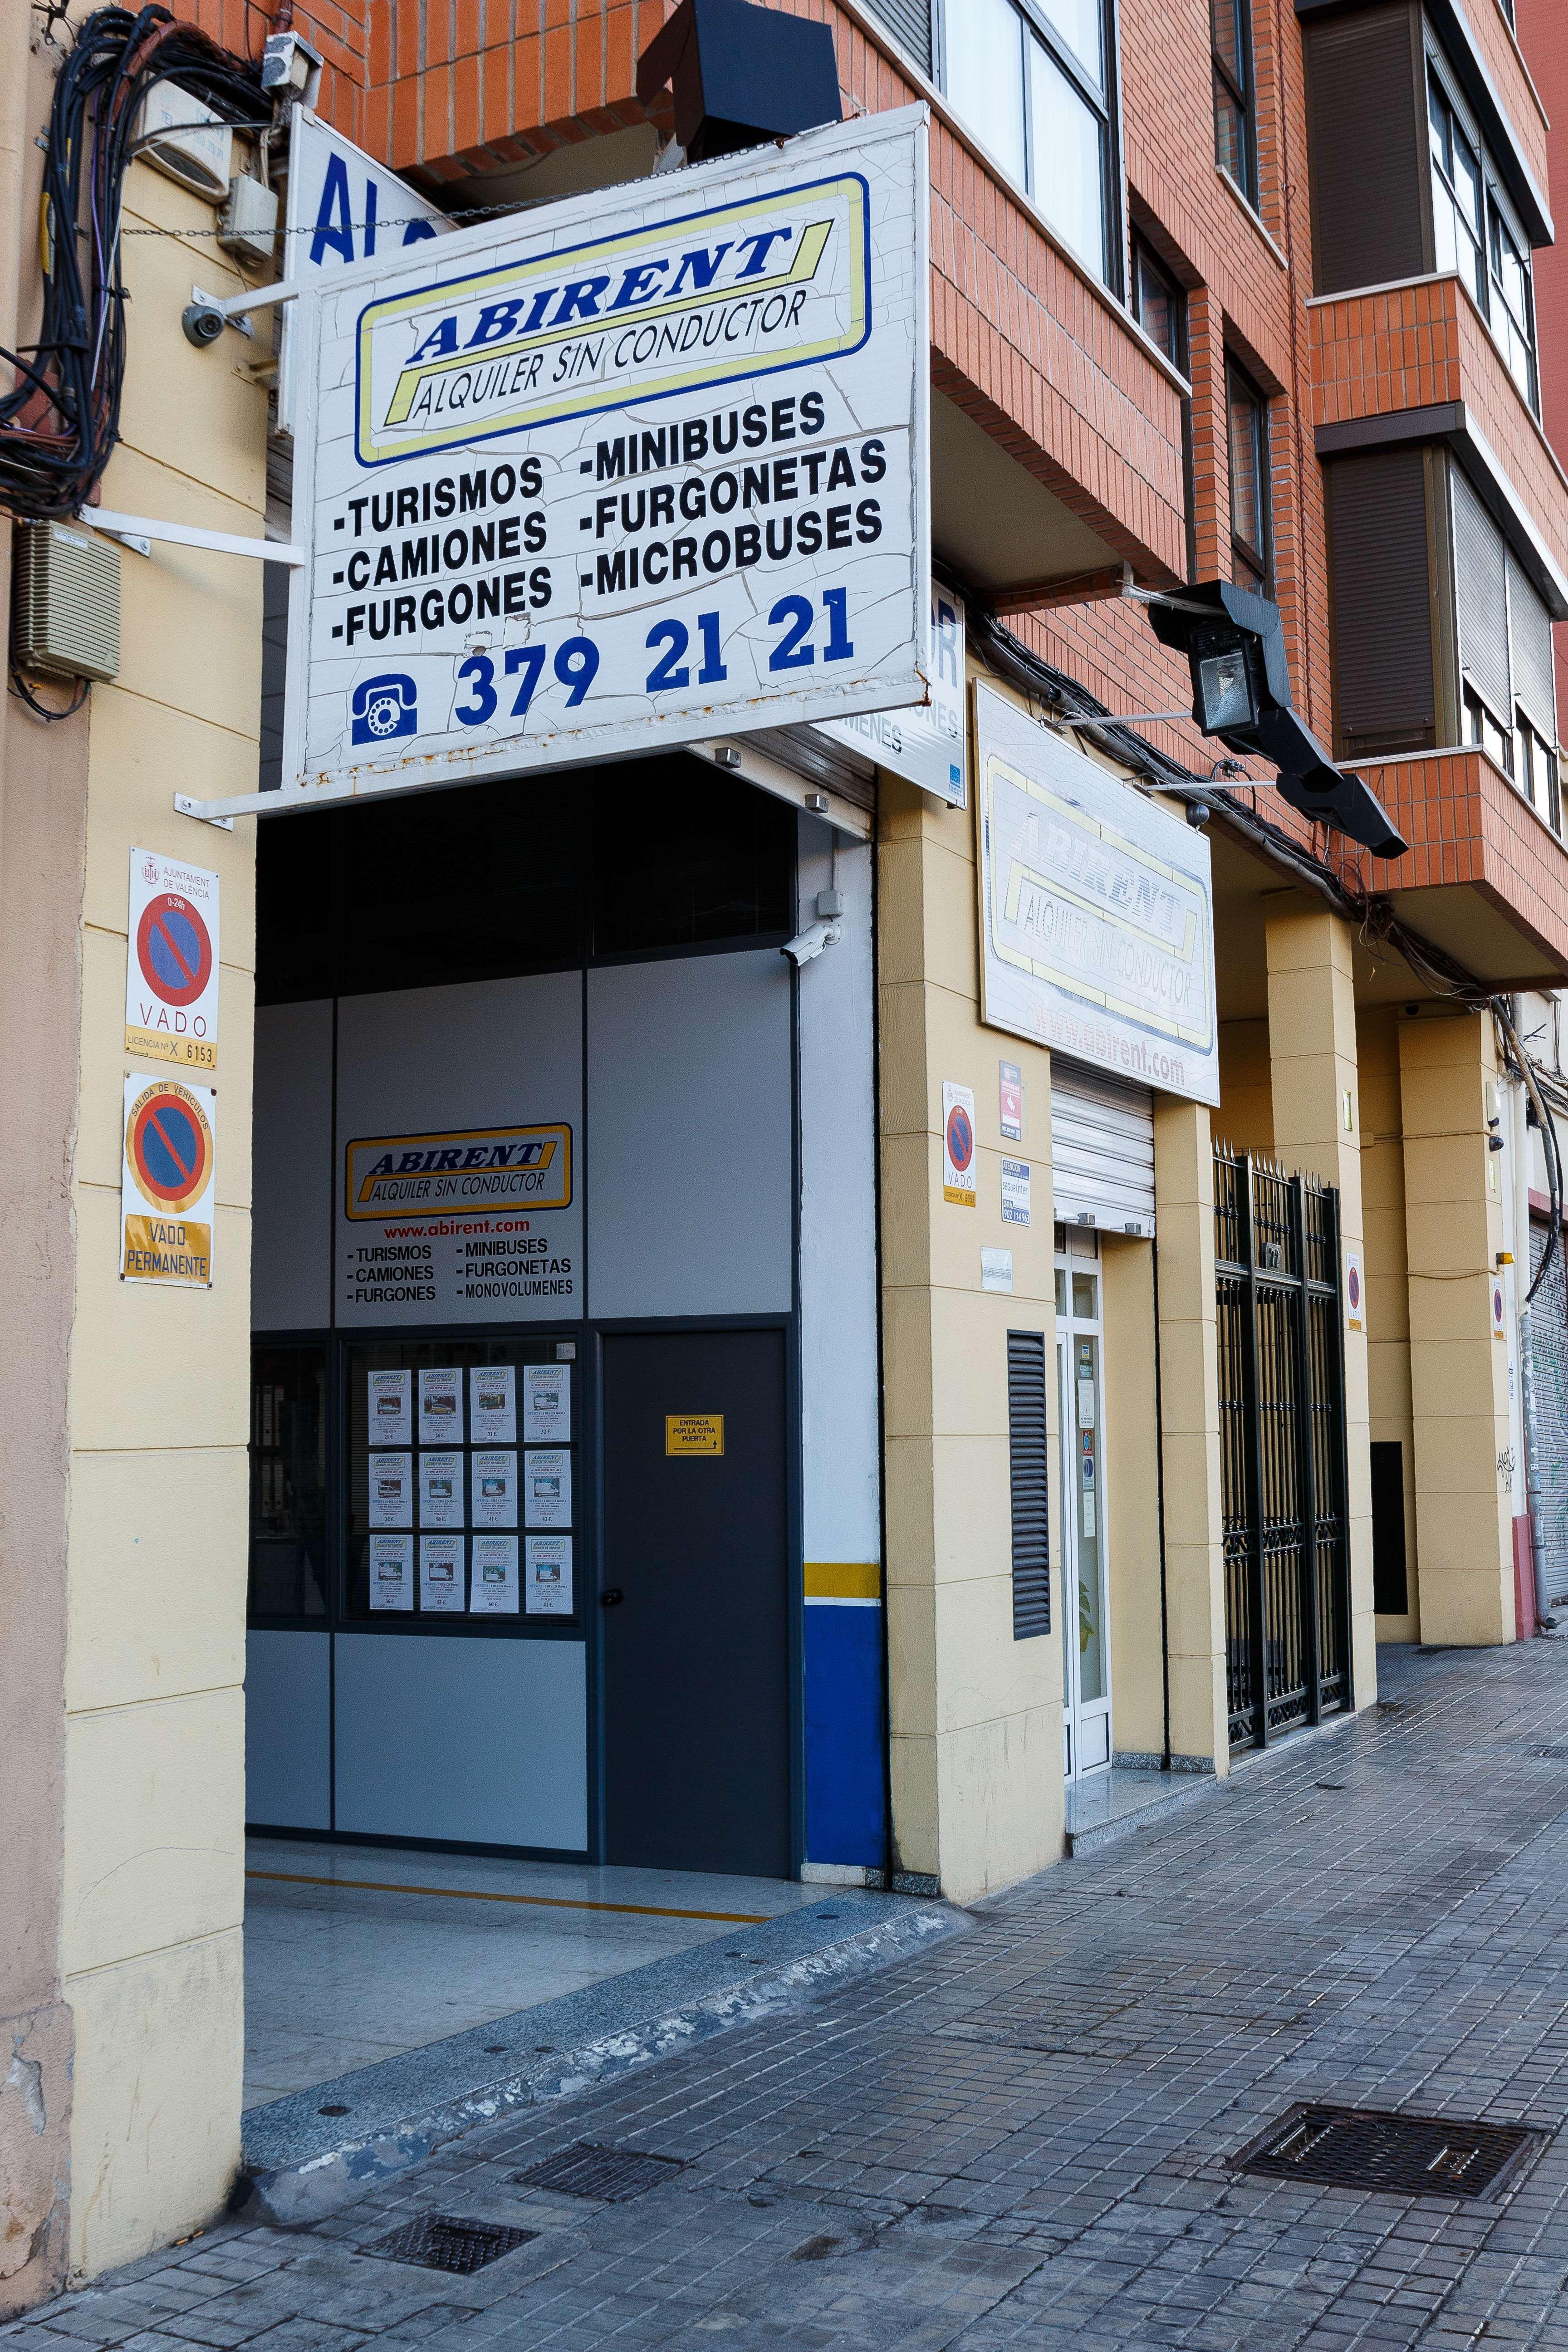 Taller de vehículos en Valencia